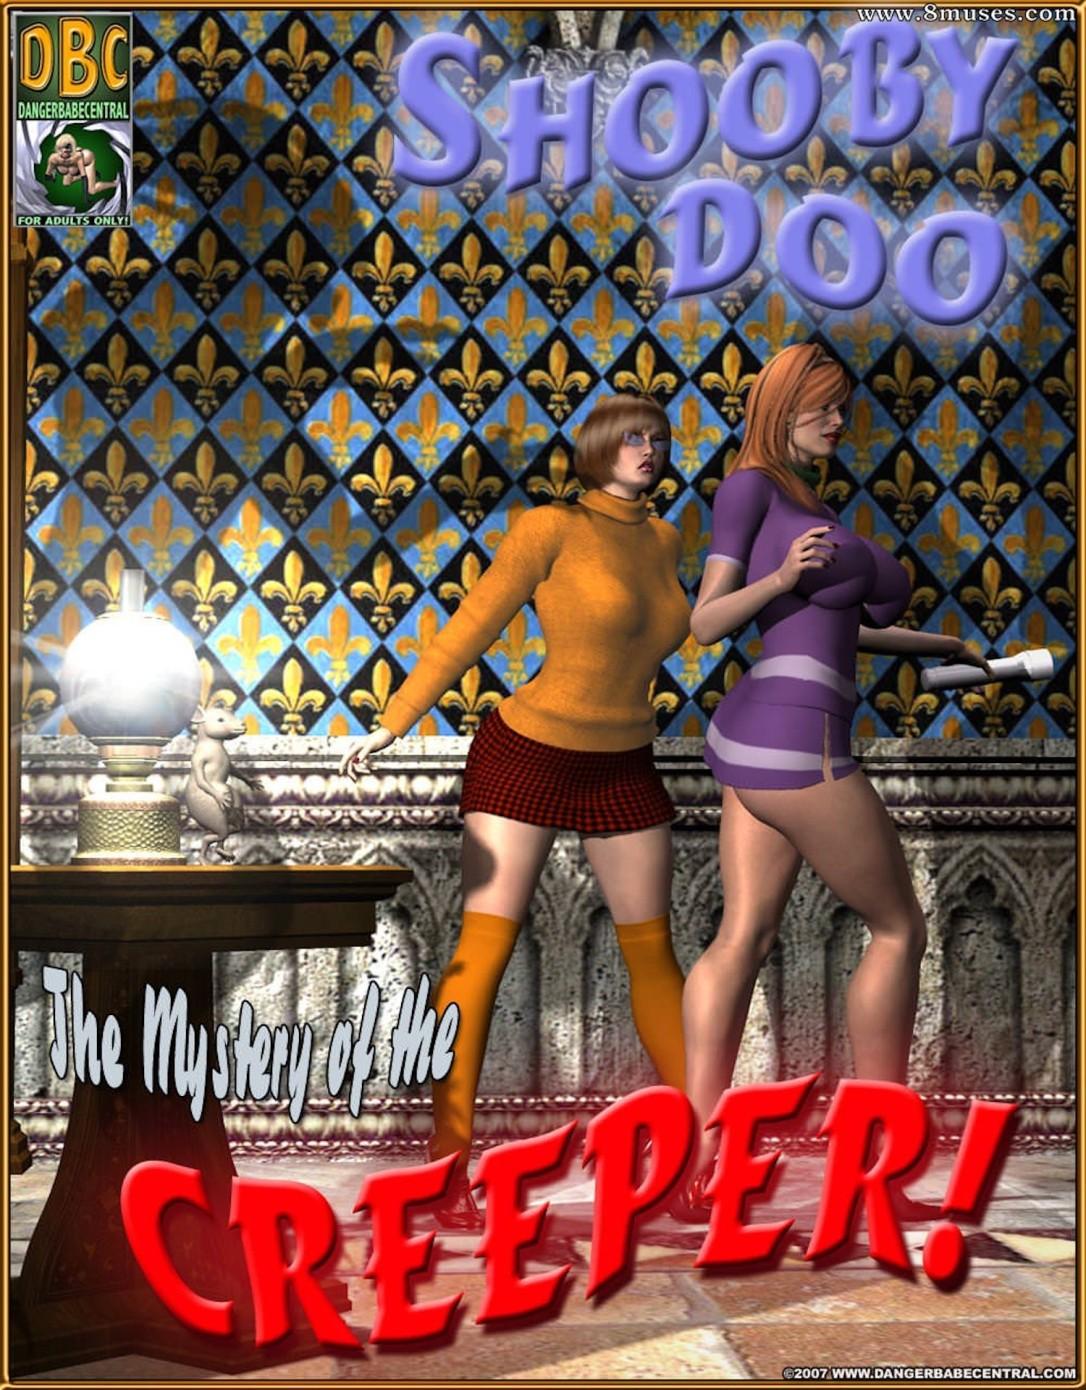 creeper01